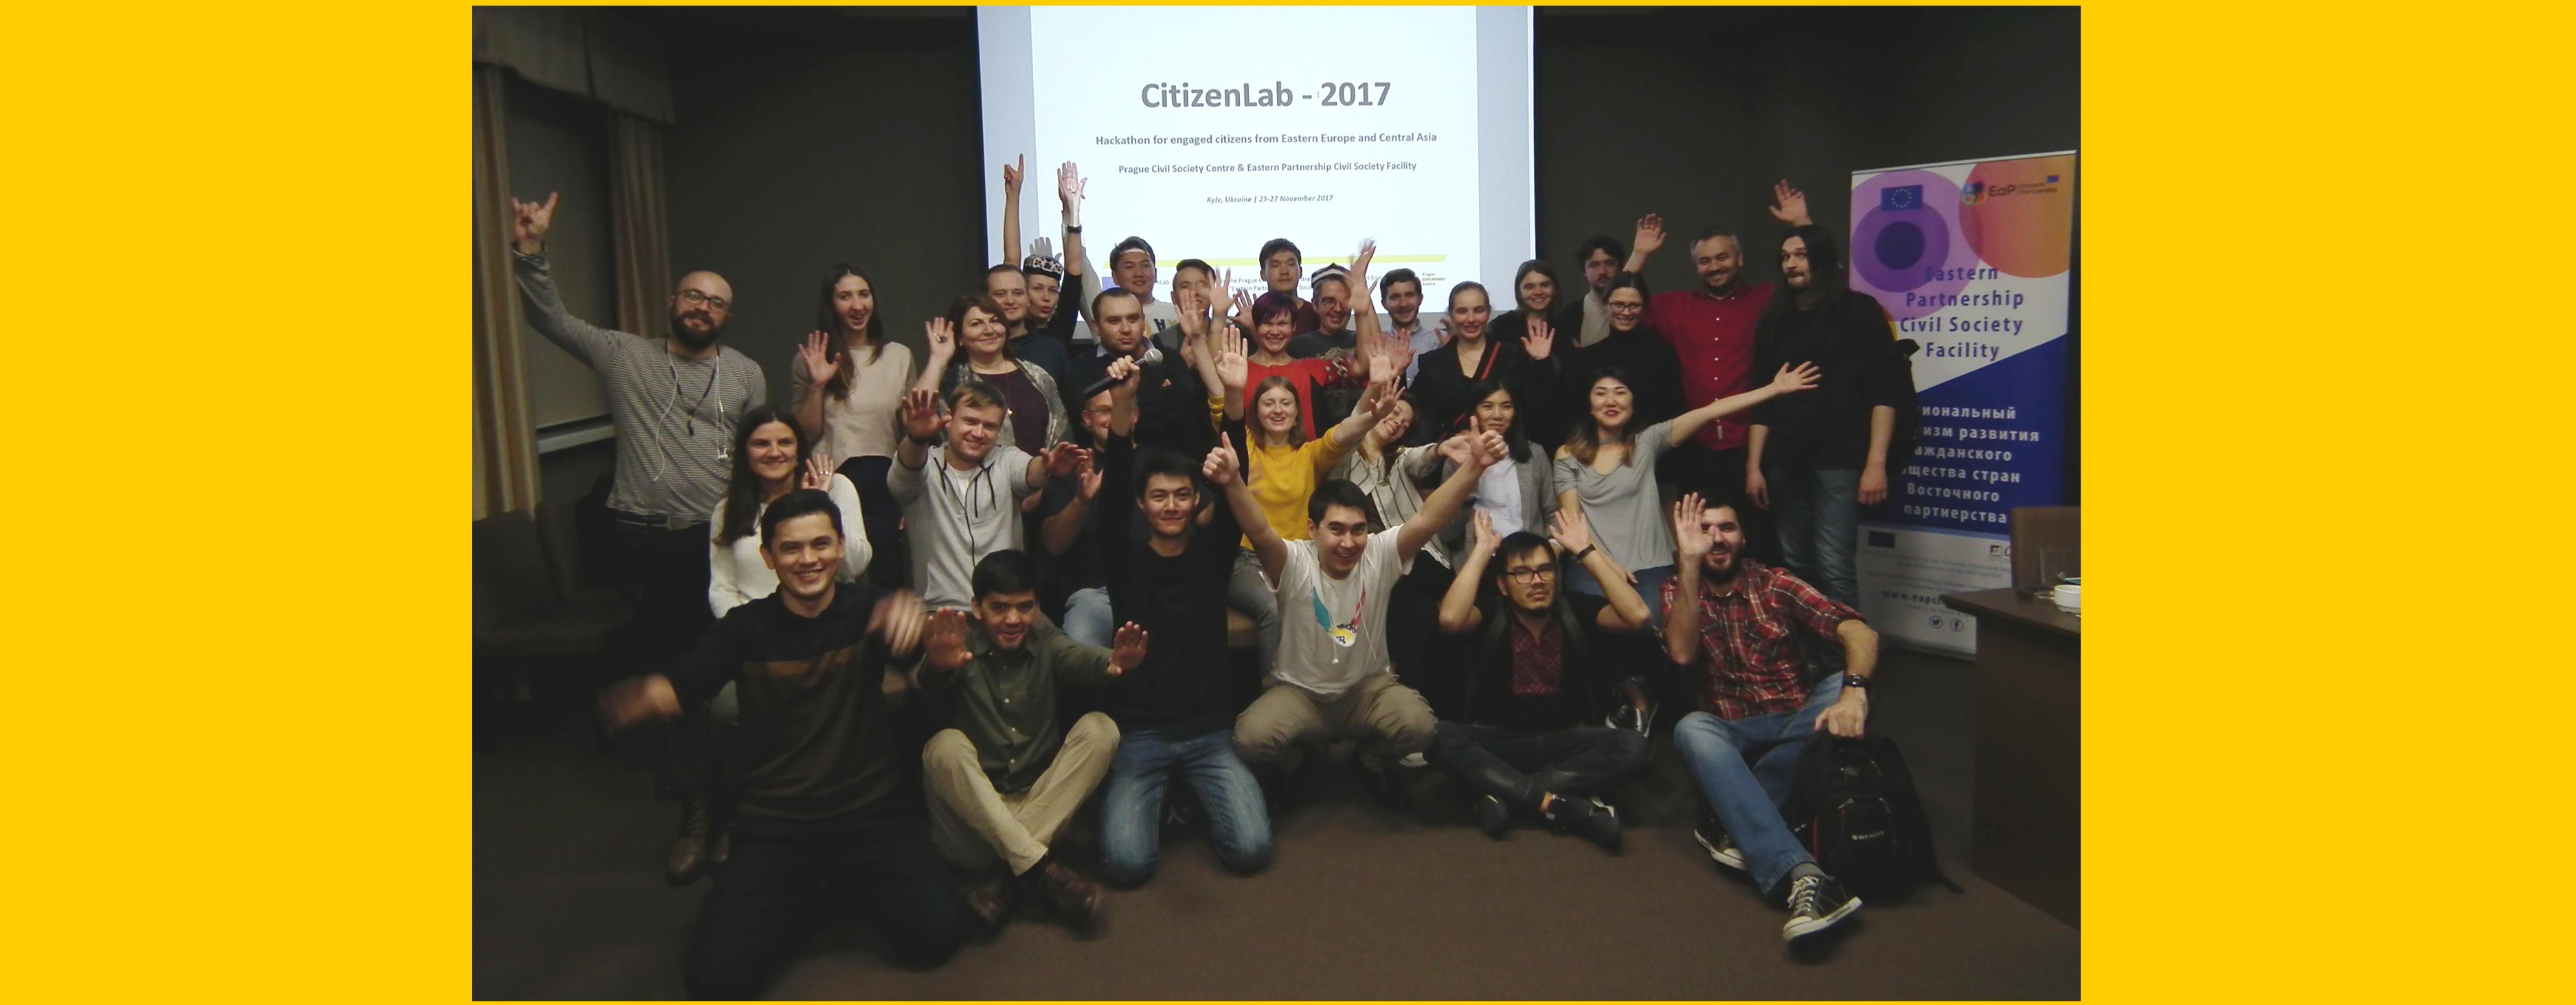 CitizenLab 2017 Hackathon, Kyiv, 25-27 November 2017